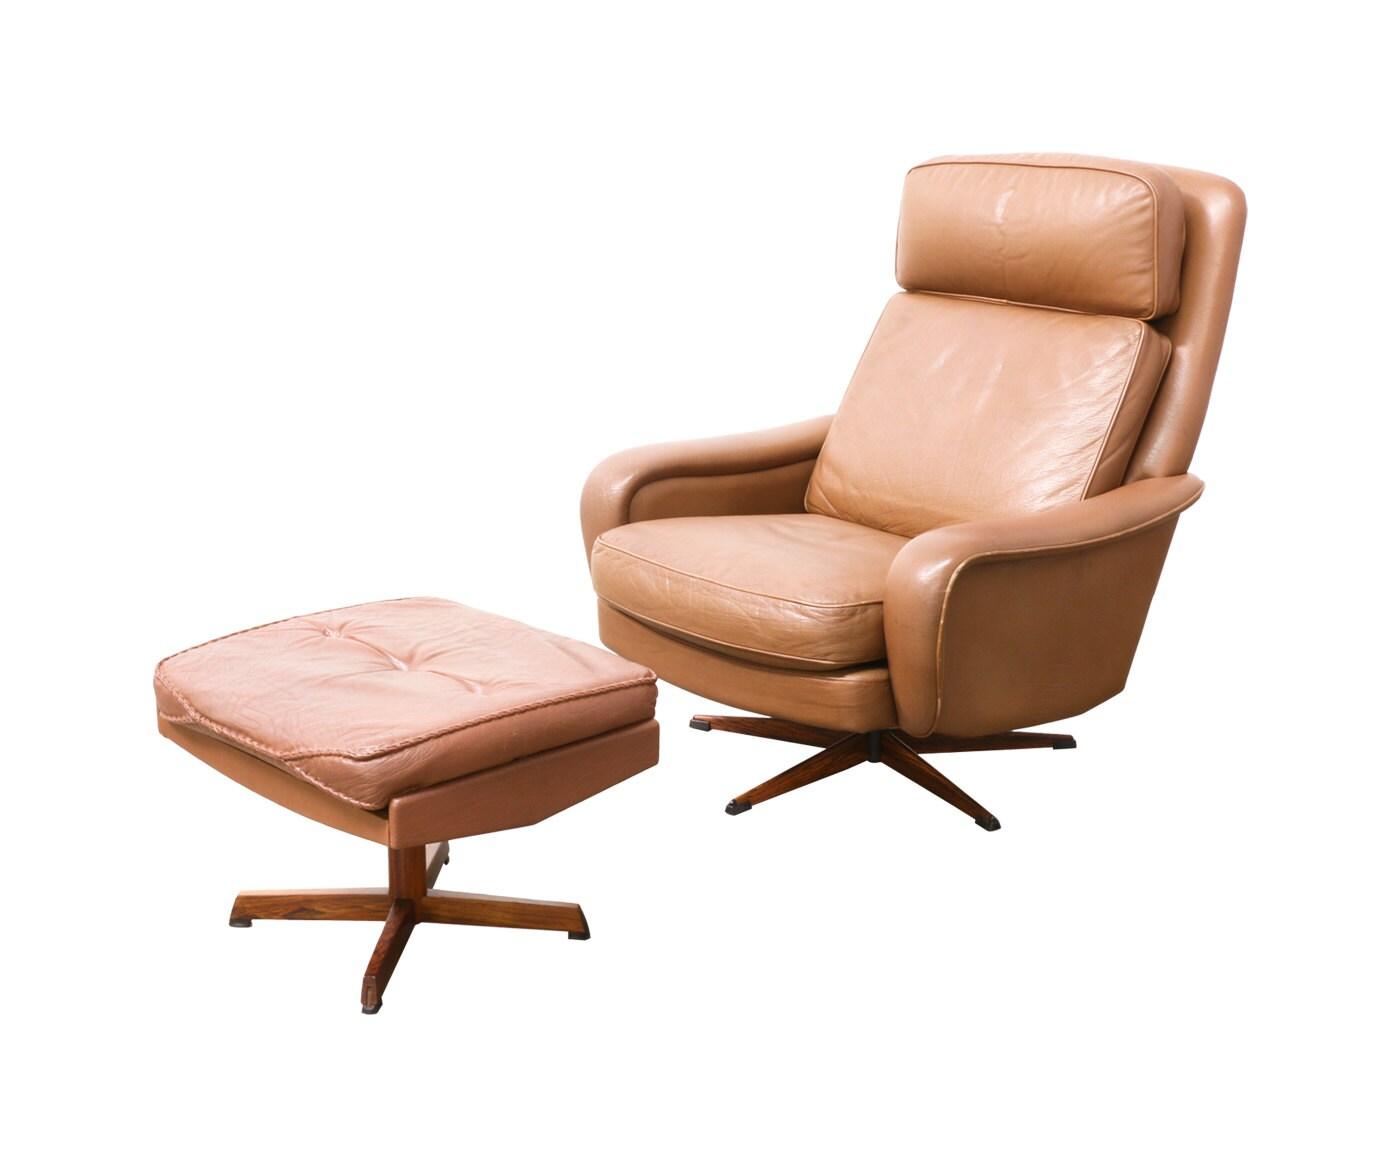 Danish Modern Leather Lounge Chair with Ottoman by DanishModernLA